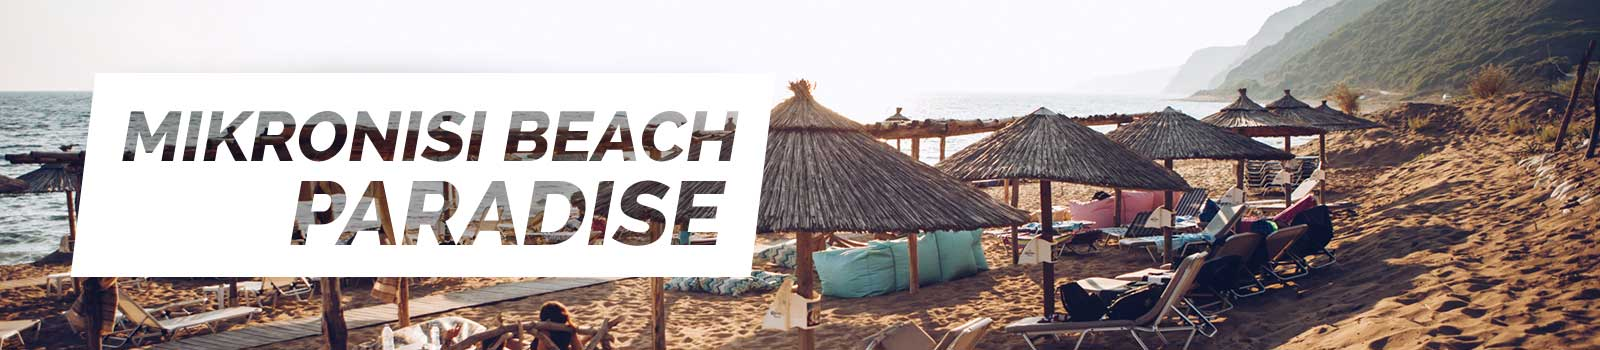 MIkronisi beach Paradise - Corfù